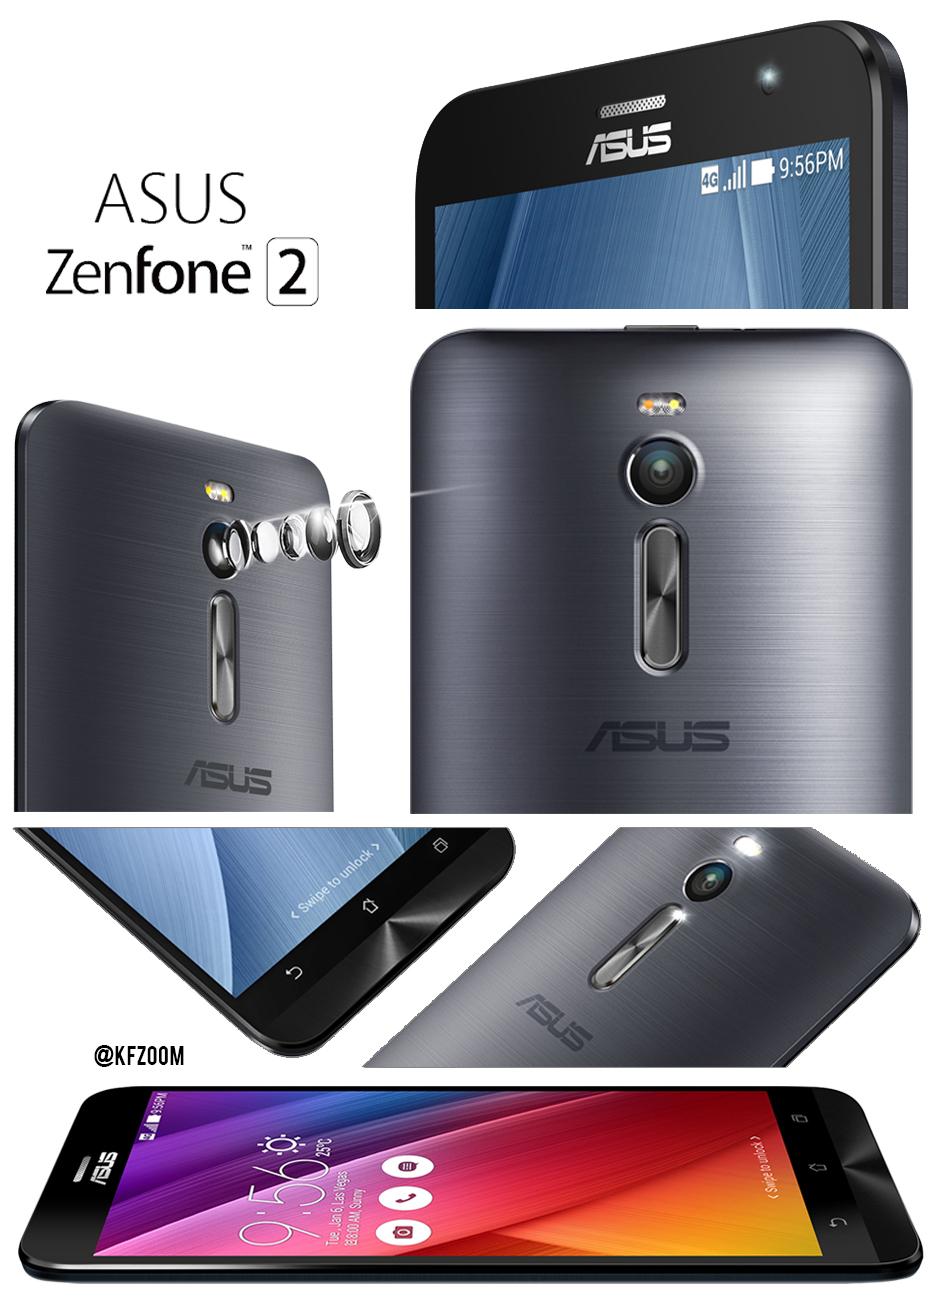 Jenama Smartphone Asus Terbaru Jenama Smartphone Asus